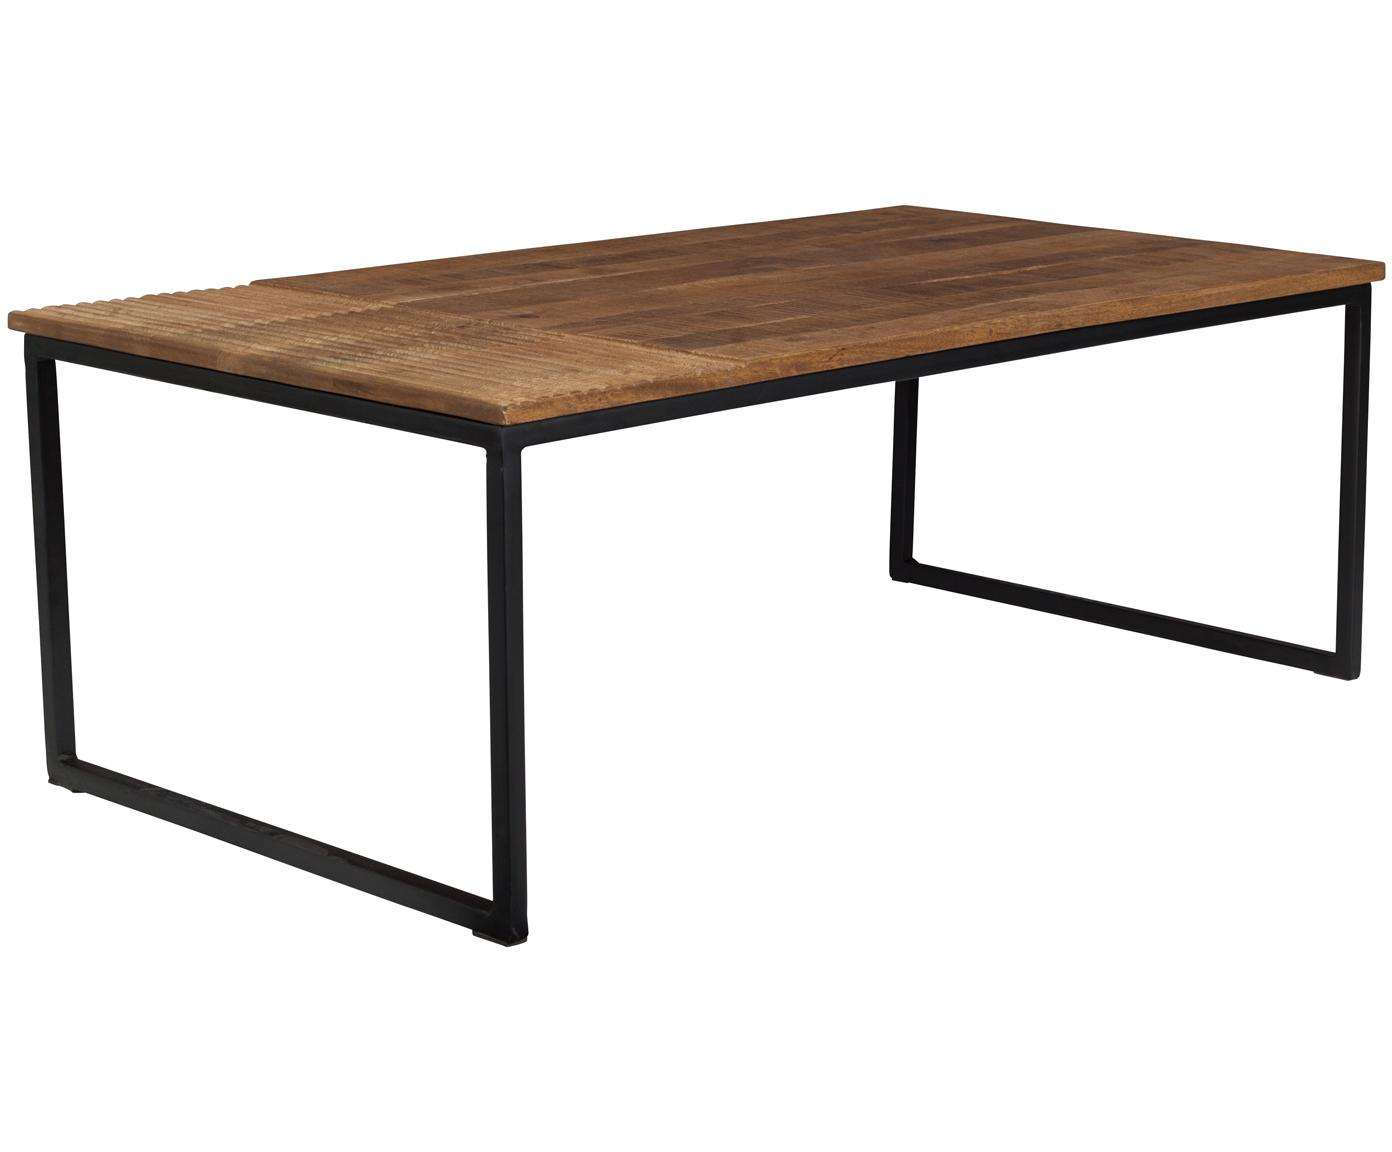 Salontafel Randi in industrieel design, Tafelblad: mangohout, massief, Frame: gepoedercoat ijzer, Tafelblad: mangohoutkleurig. Poten: zwart, 110 x 60 cm